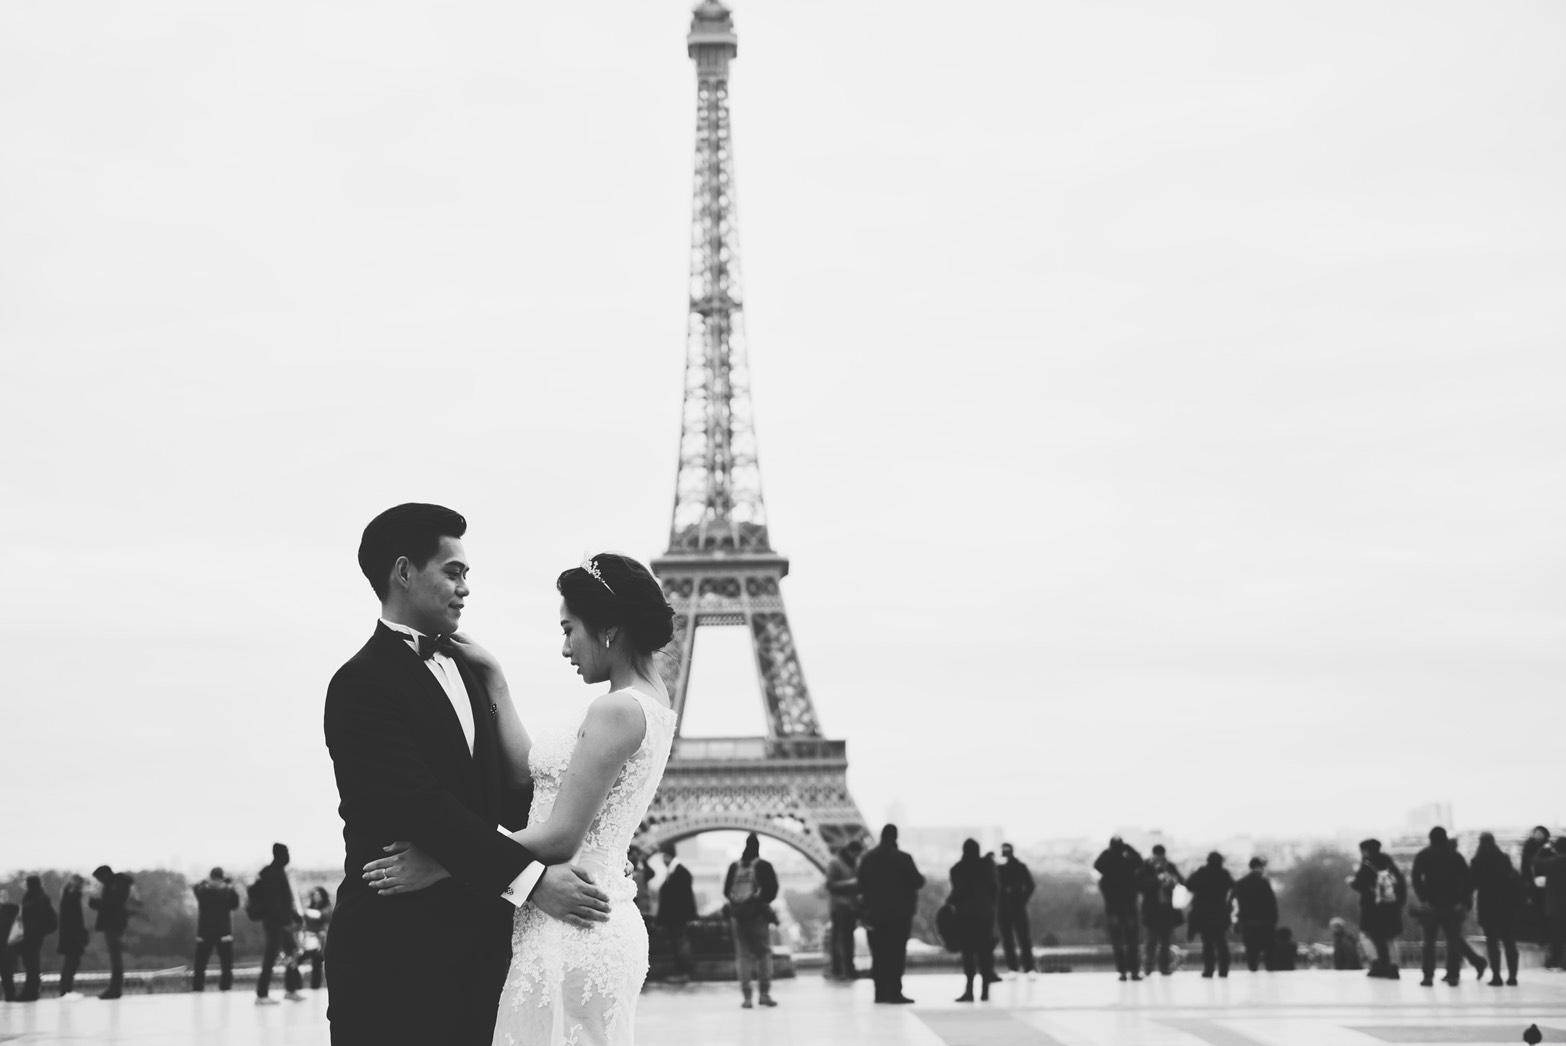 PUREFOTO_海外婚紗攝影Oversea_Prewedding_巴黎鐵塔婚紗